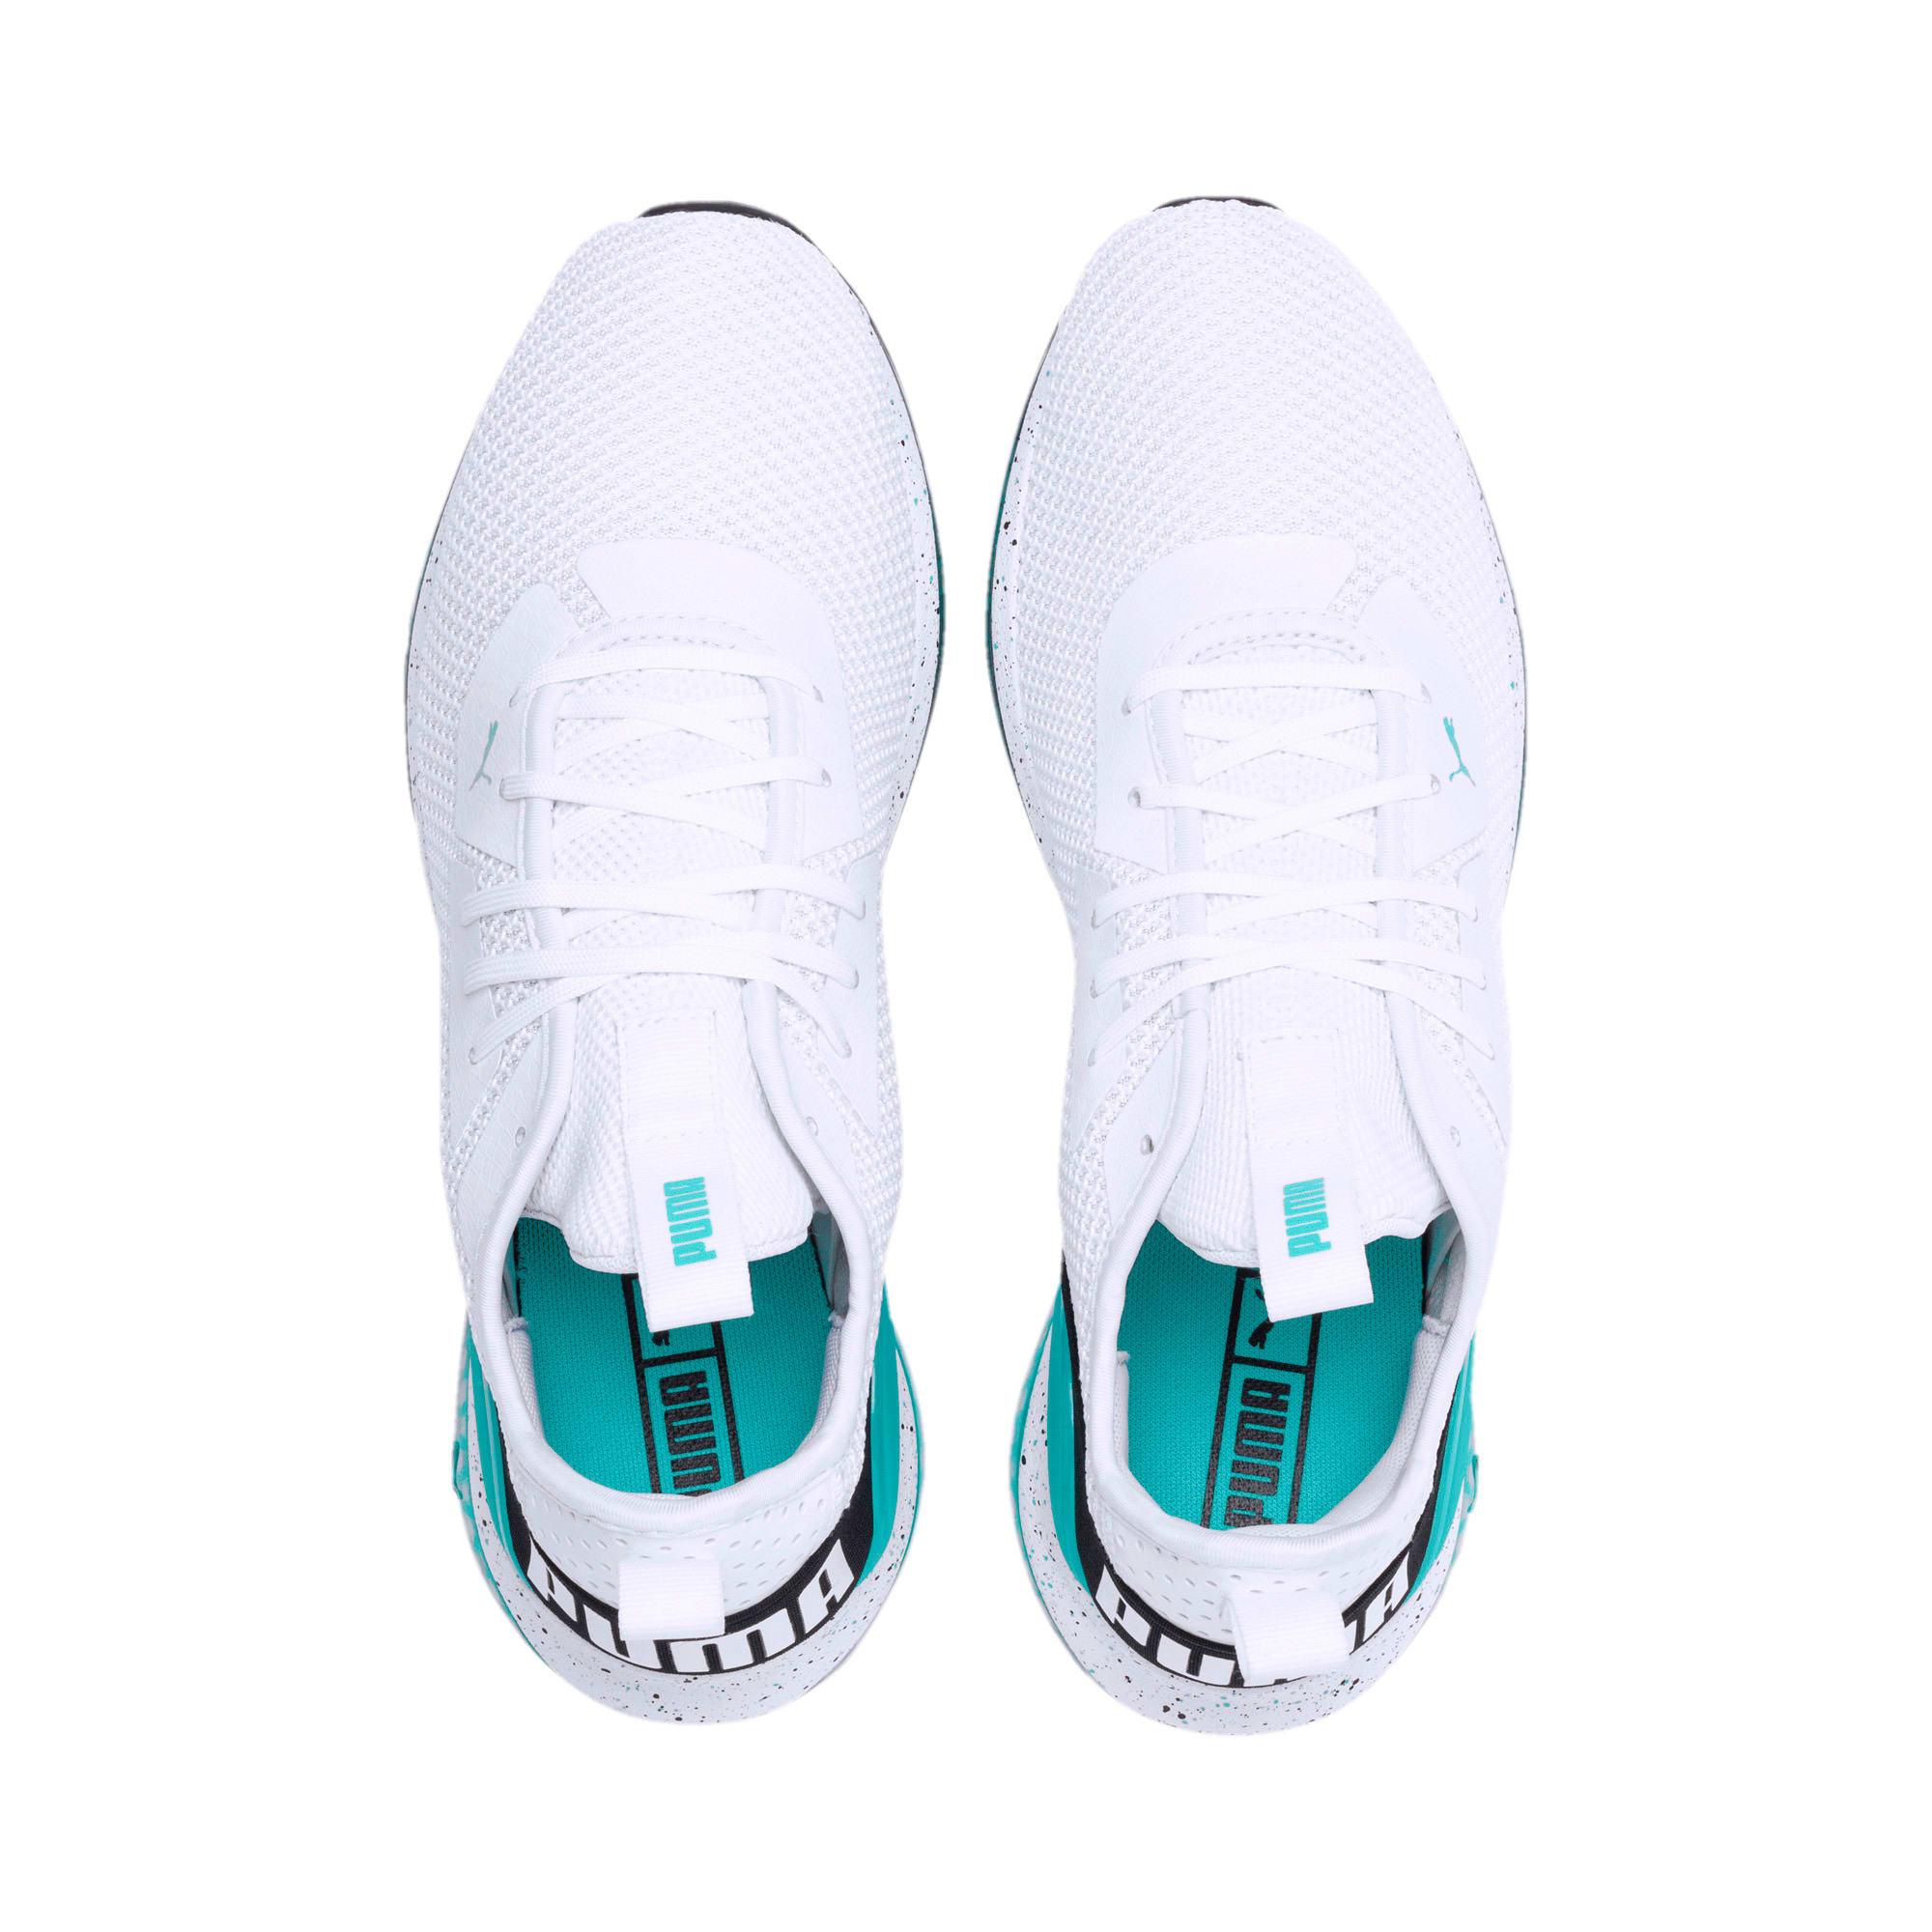 Miniatura 8 de Zapatos de entrenamiento CELL Descend Weave para hombre, White-Black-Blue Turquoise, mediano